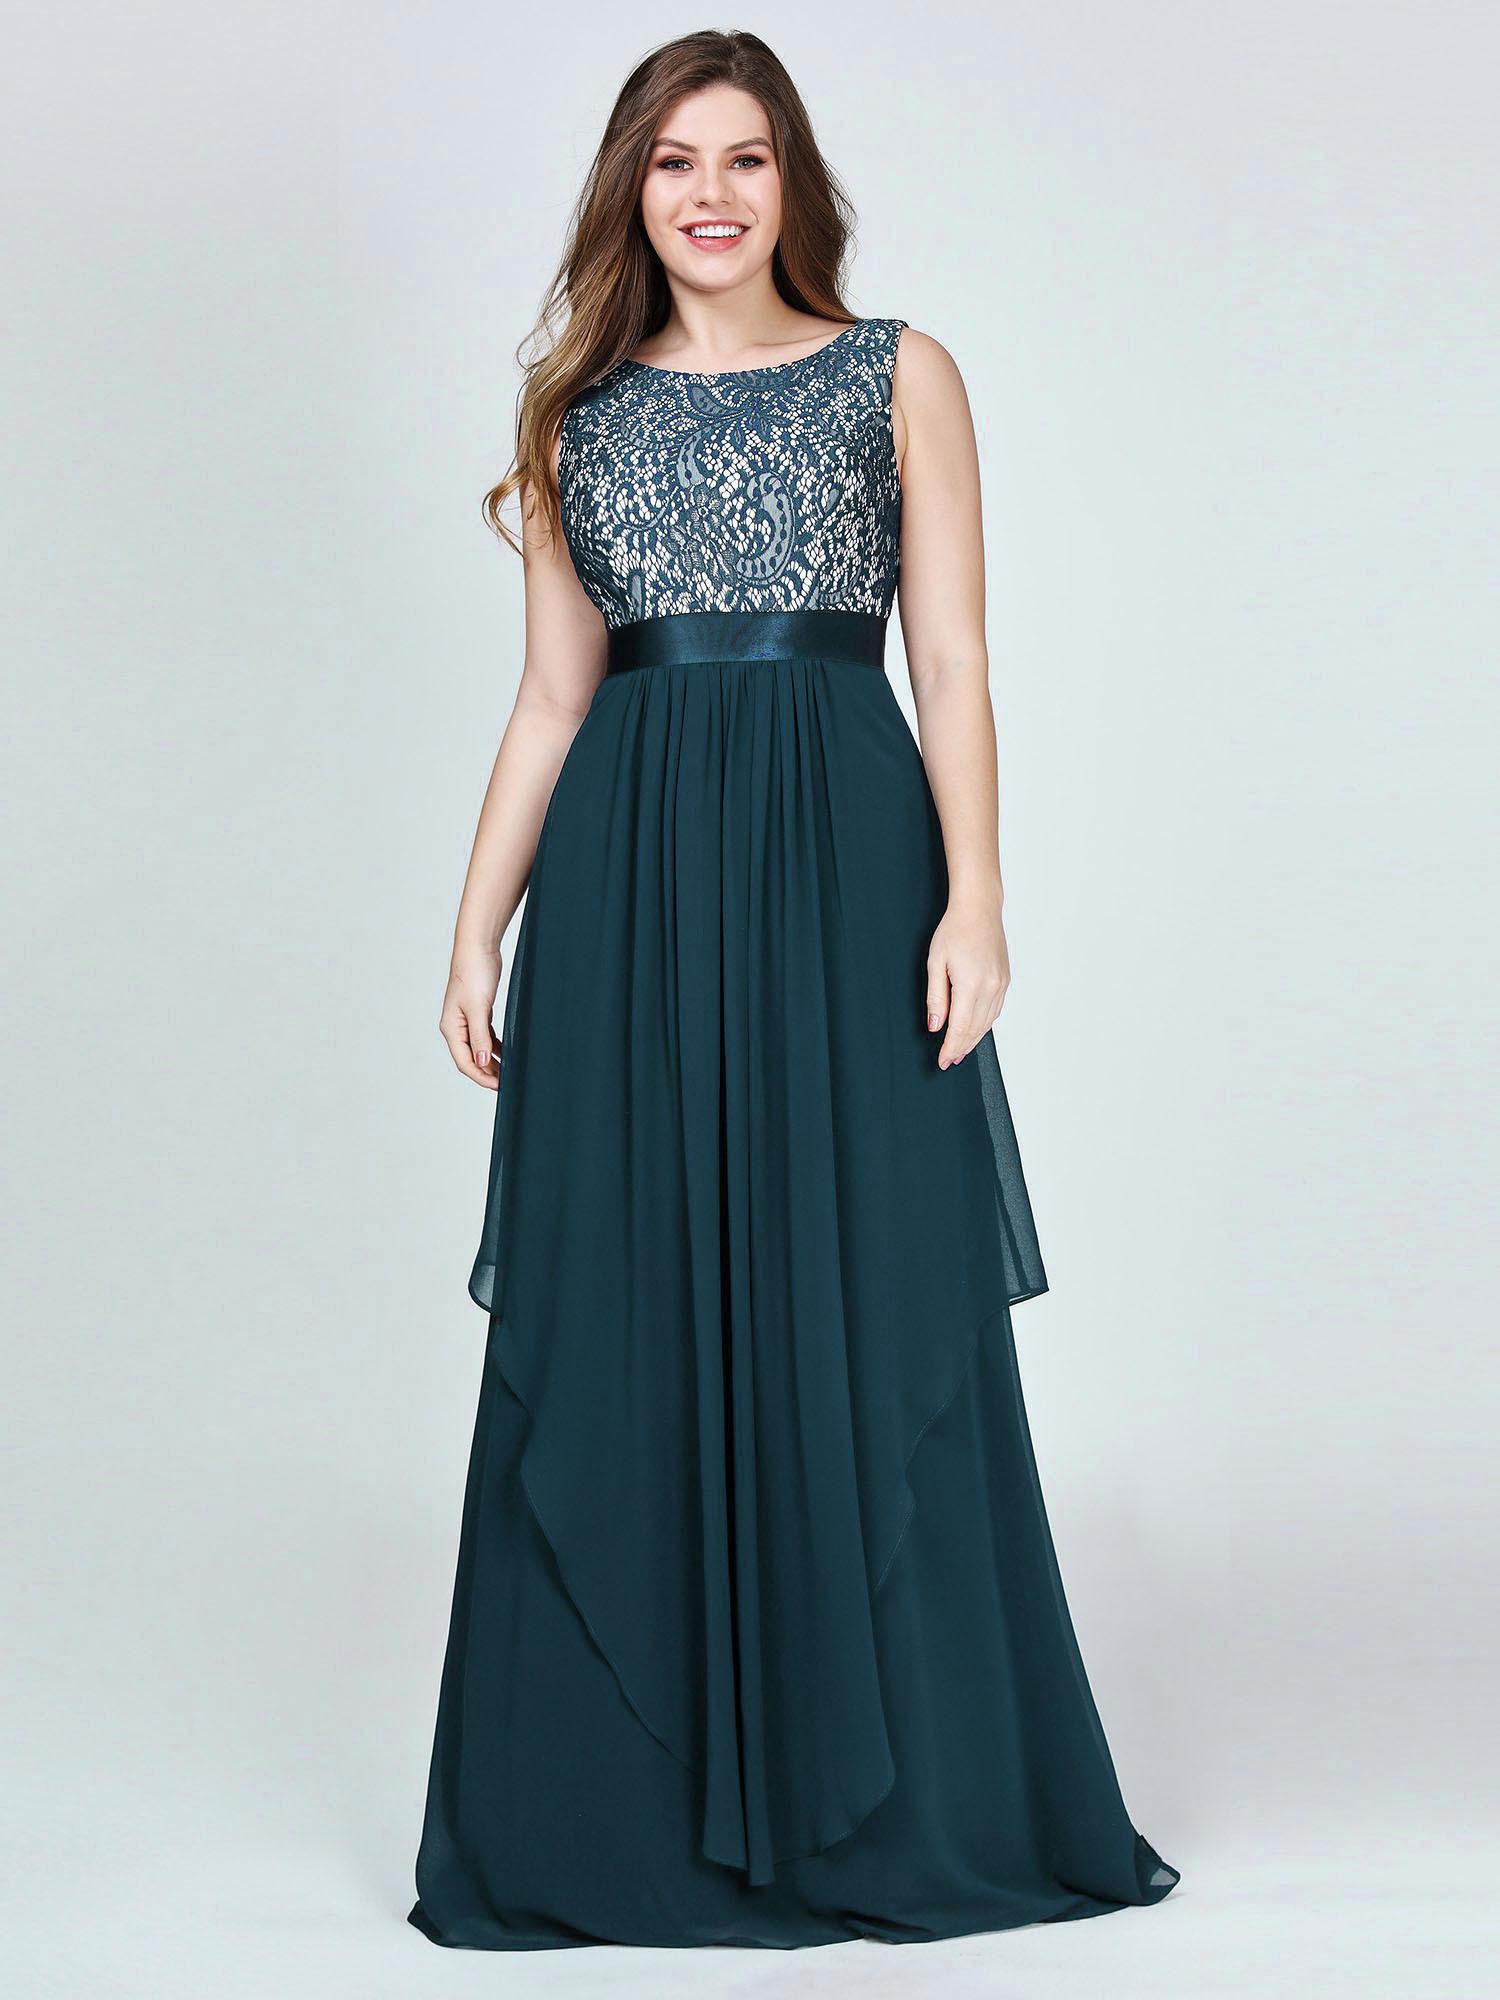 10 Genial Abendkleid In Großen Größen DesignFormal Großartig Abendkleid In Großen Größen Bester Preis